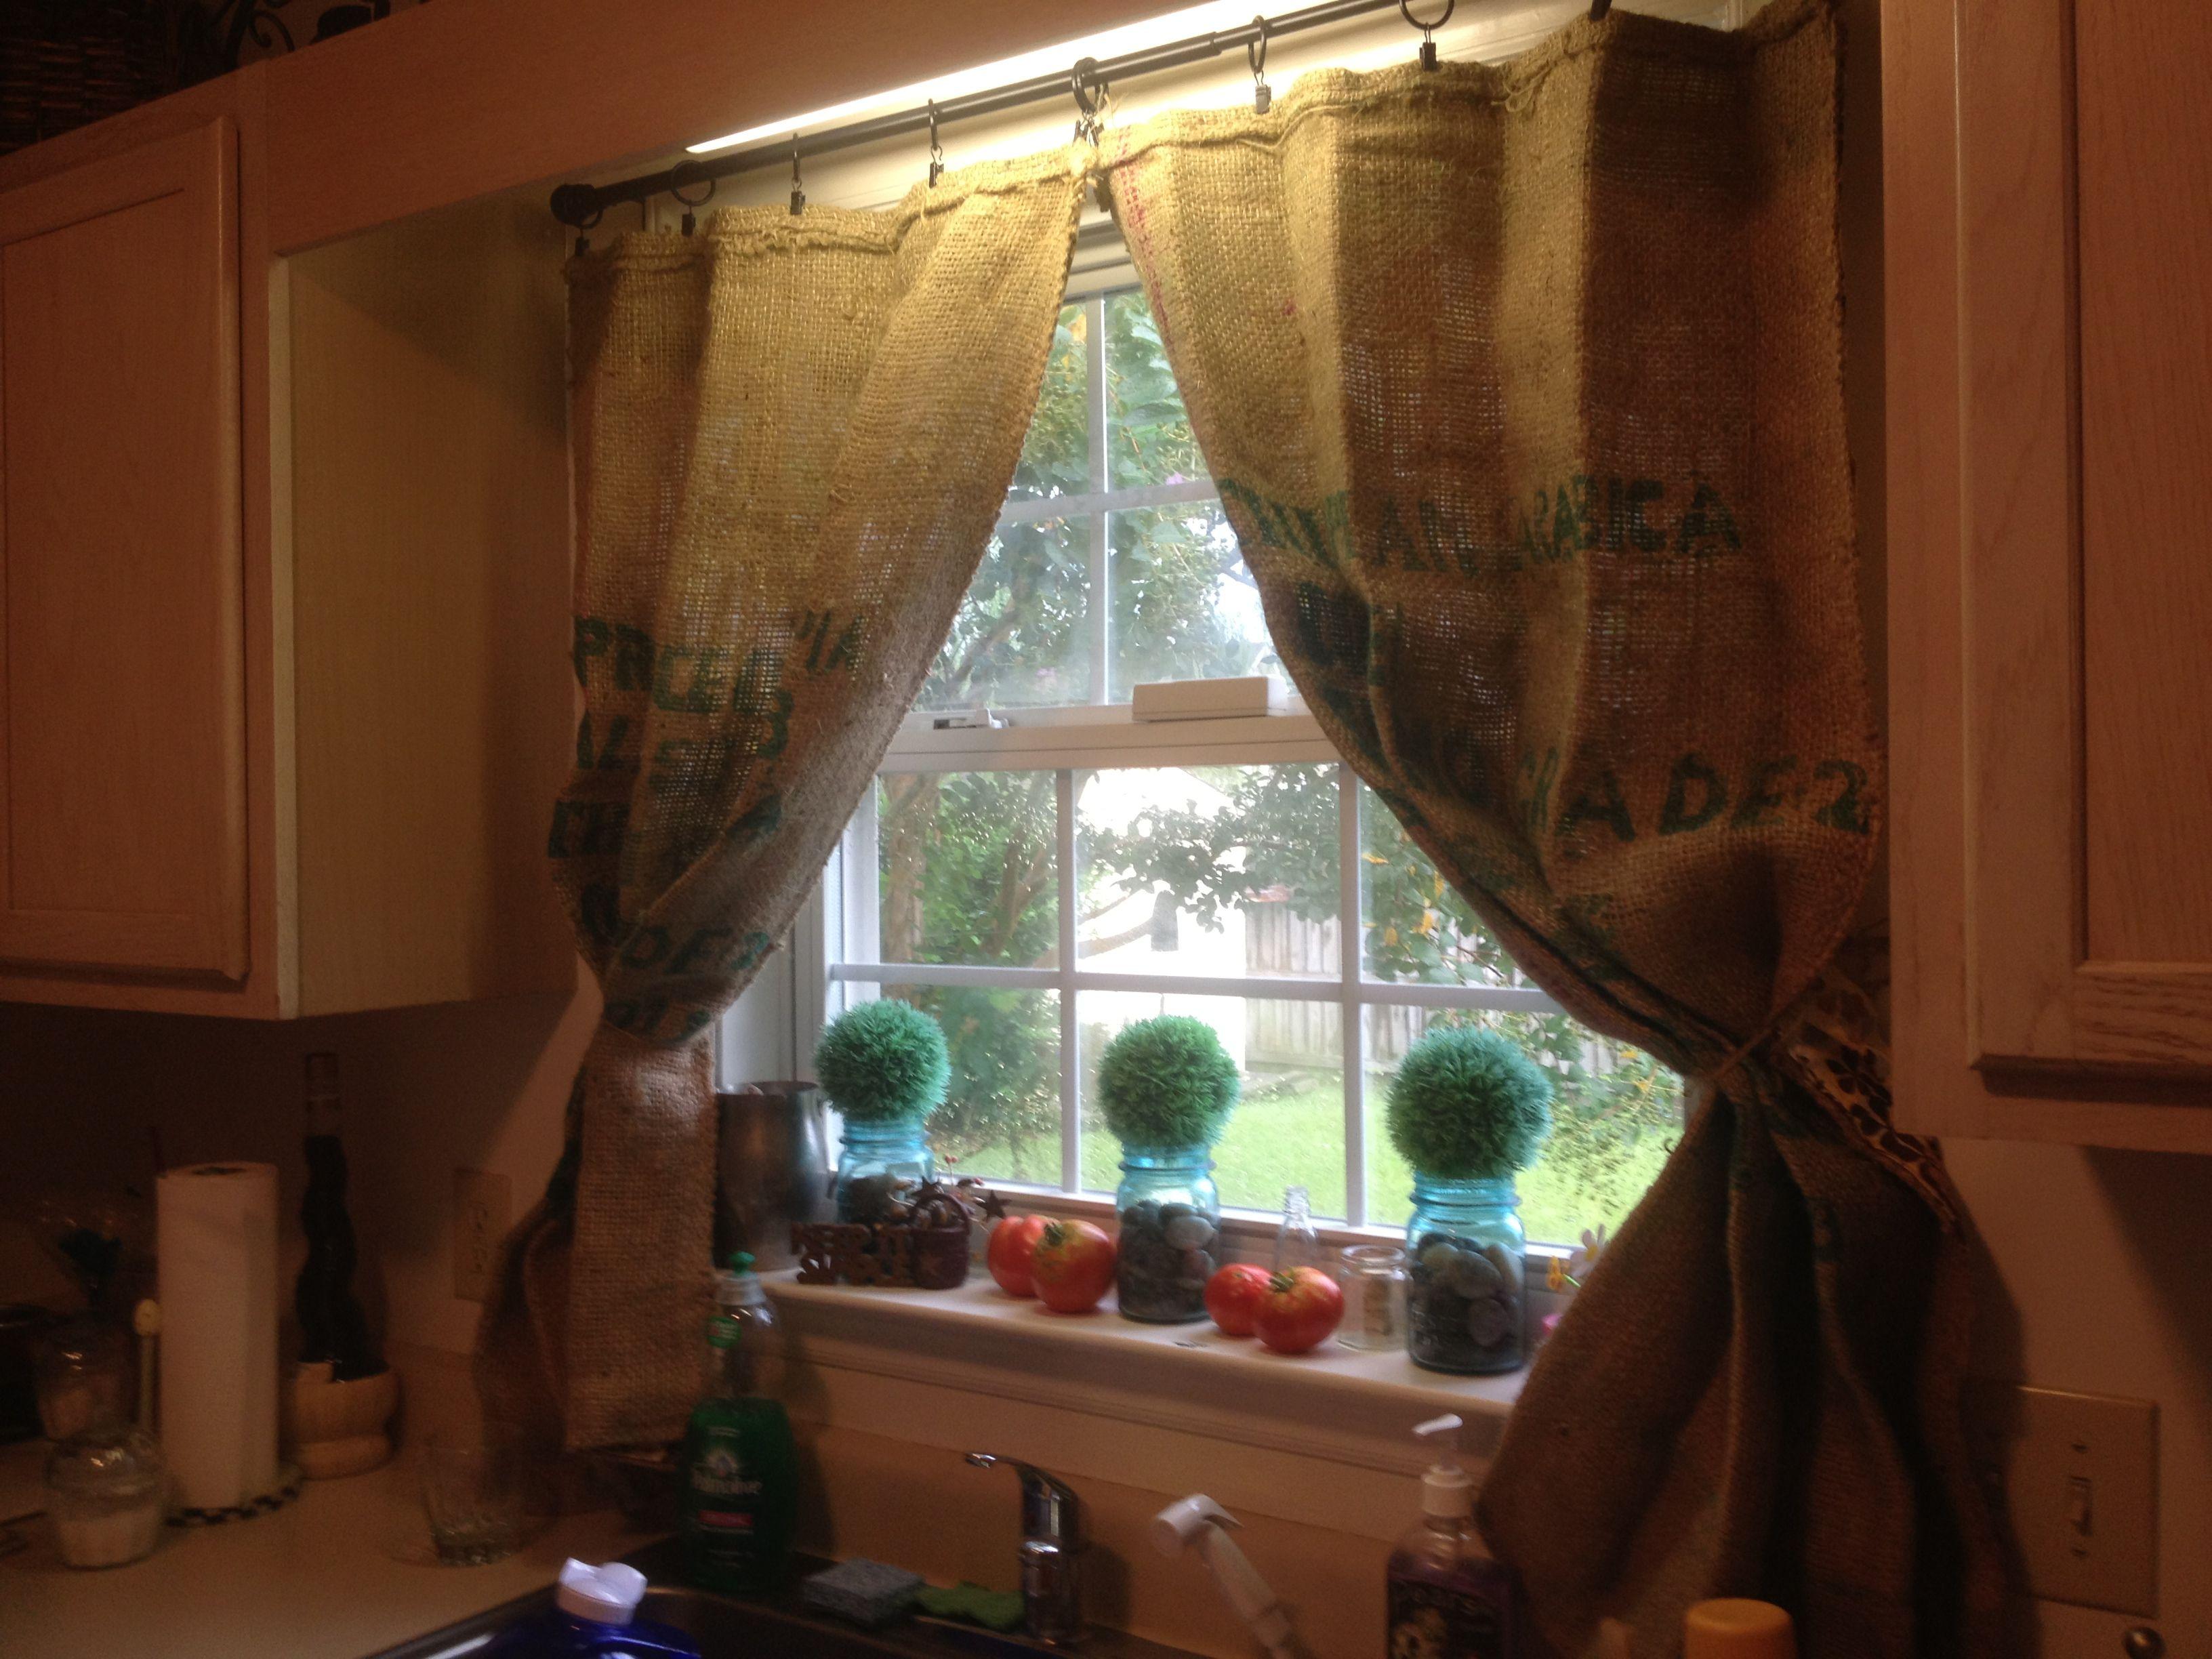 No curtain window ideas  burlap coffee bag curtains  home decor  pinterest  burlap coffee